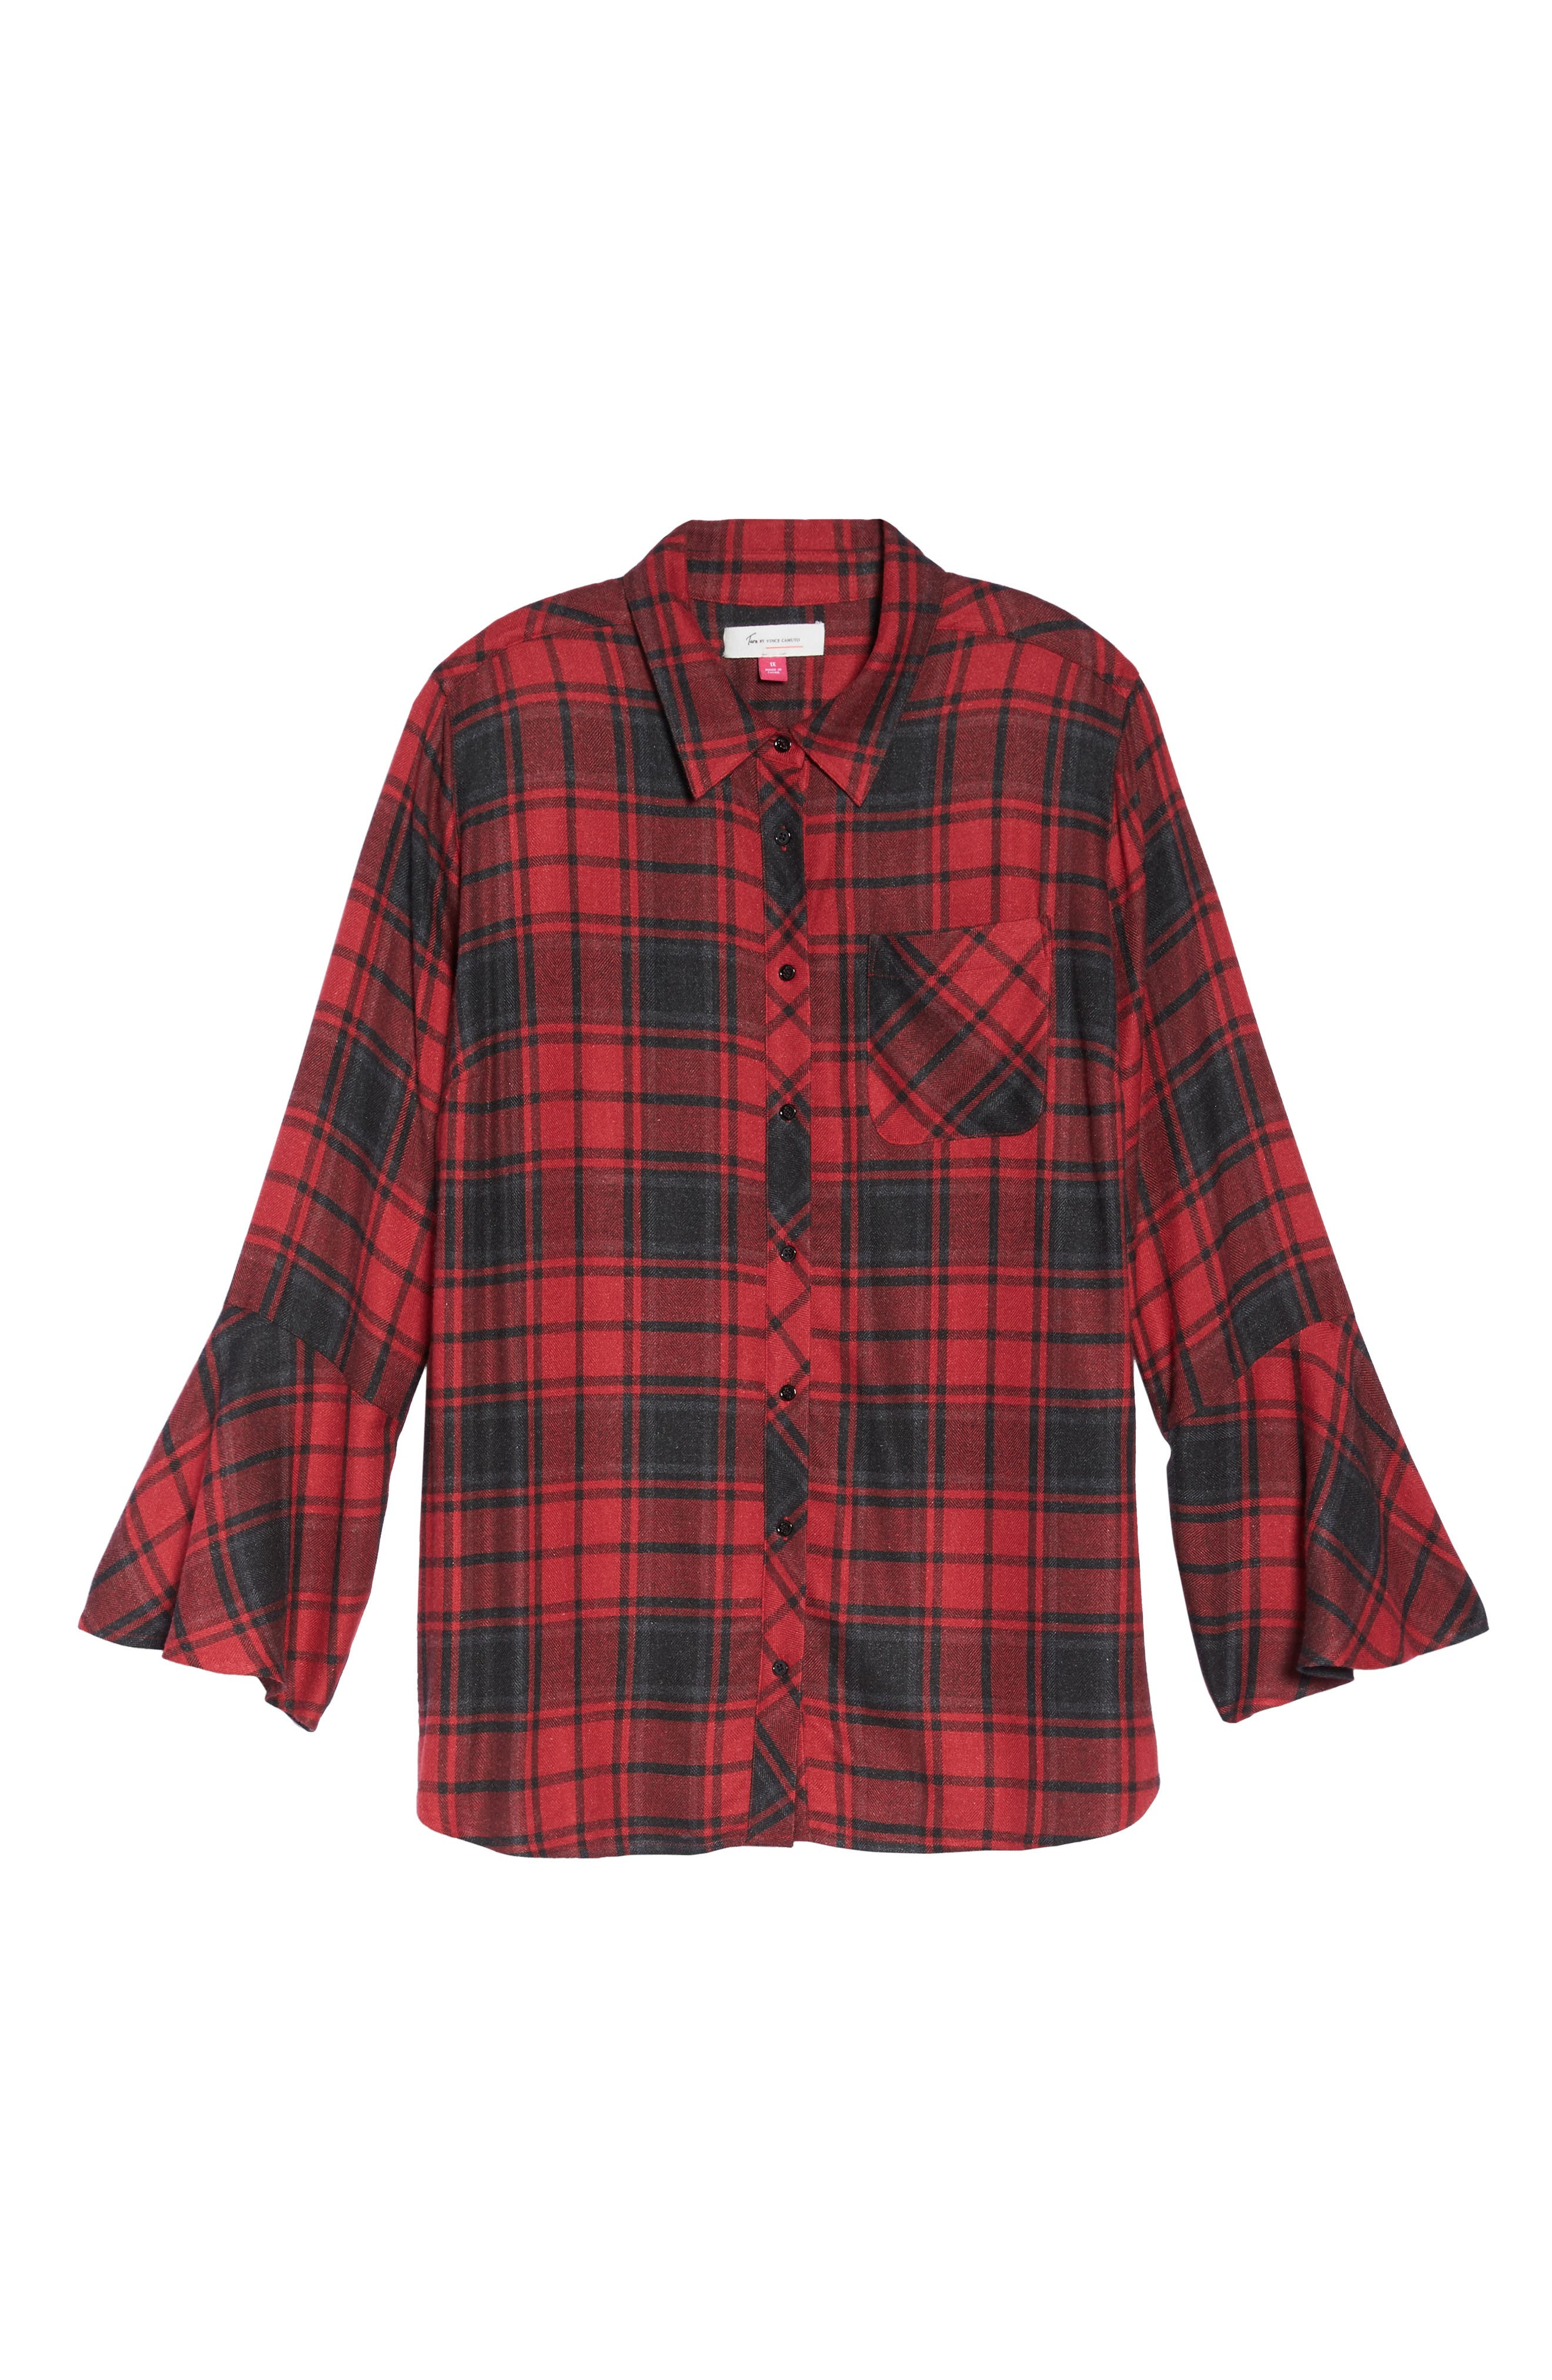 Stateside Bell Sleeve Shirt,                             Alternate thumbnail 6, color,                             Russet Red